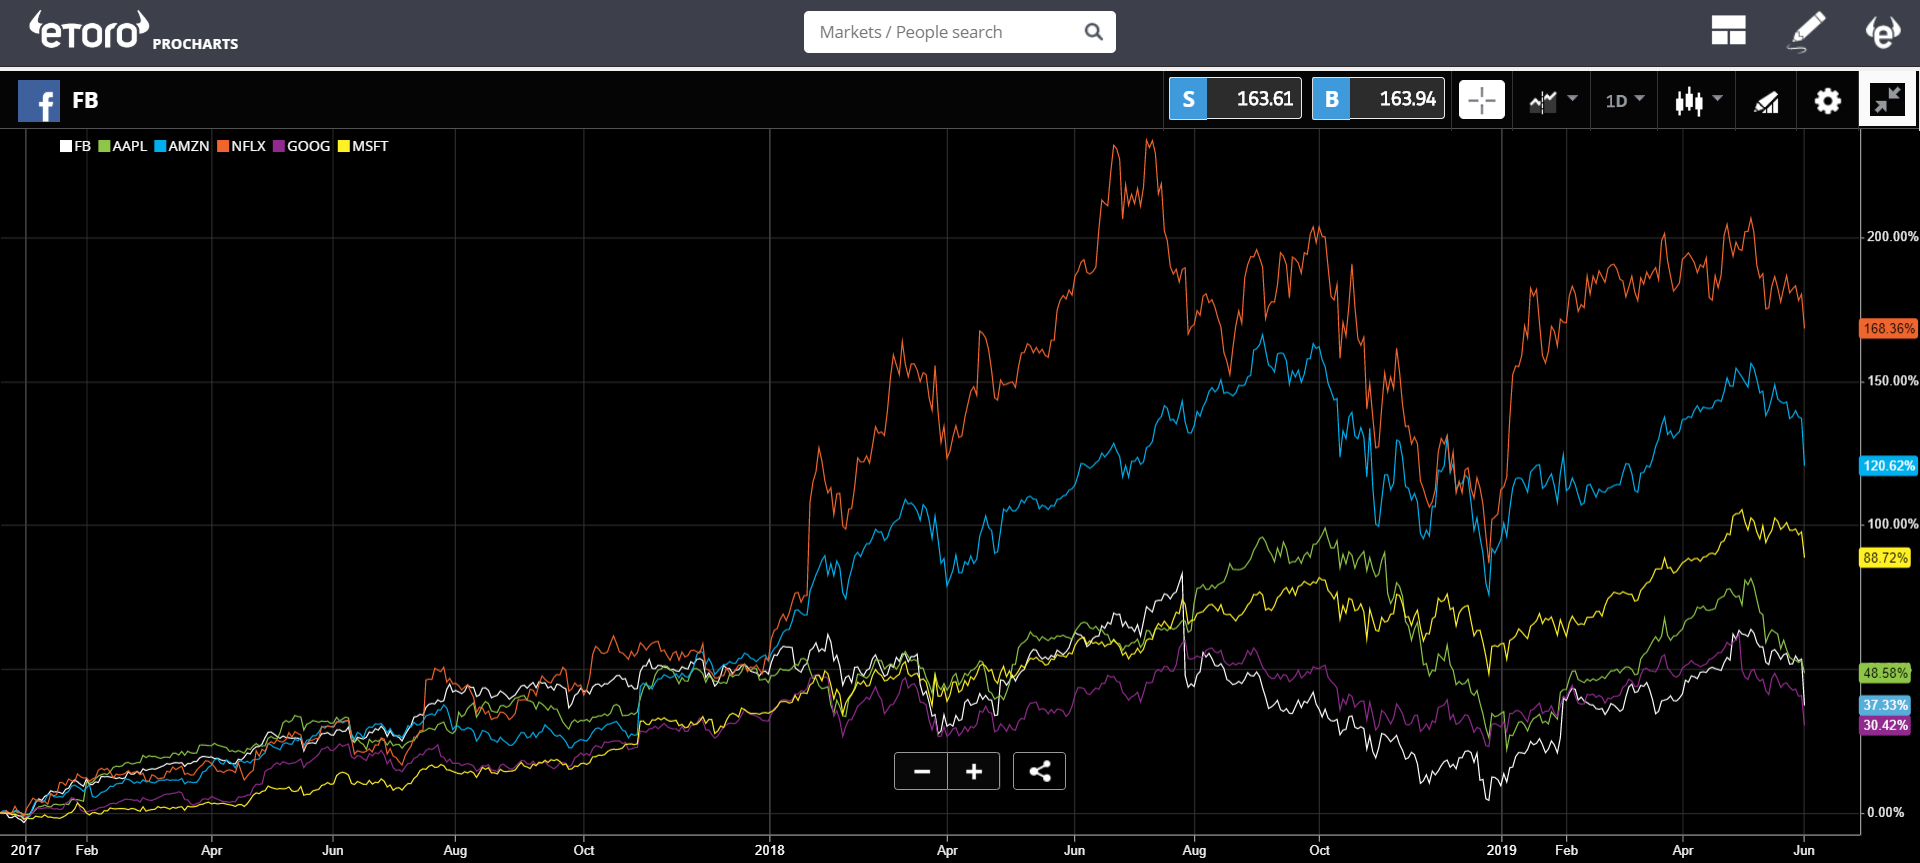 market, cryptocurrency, bitcoin, blockchain, trading, crypto, FAANG,